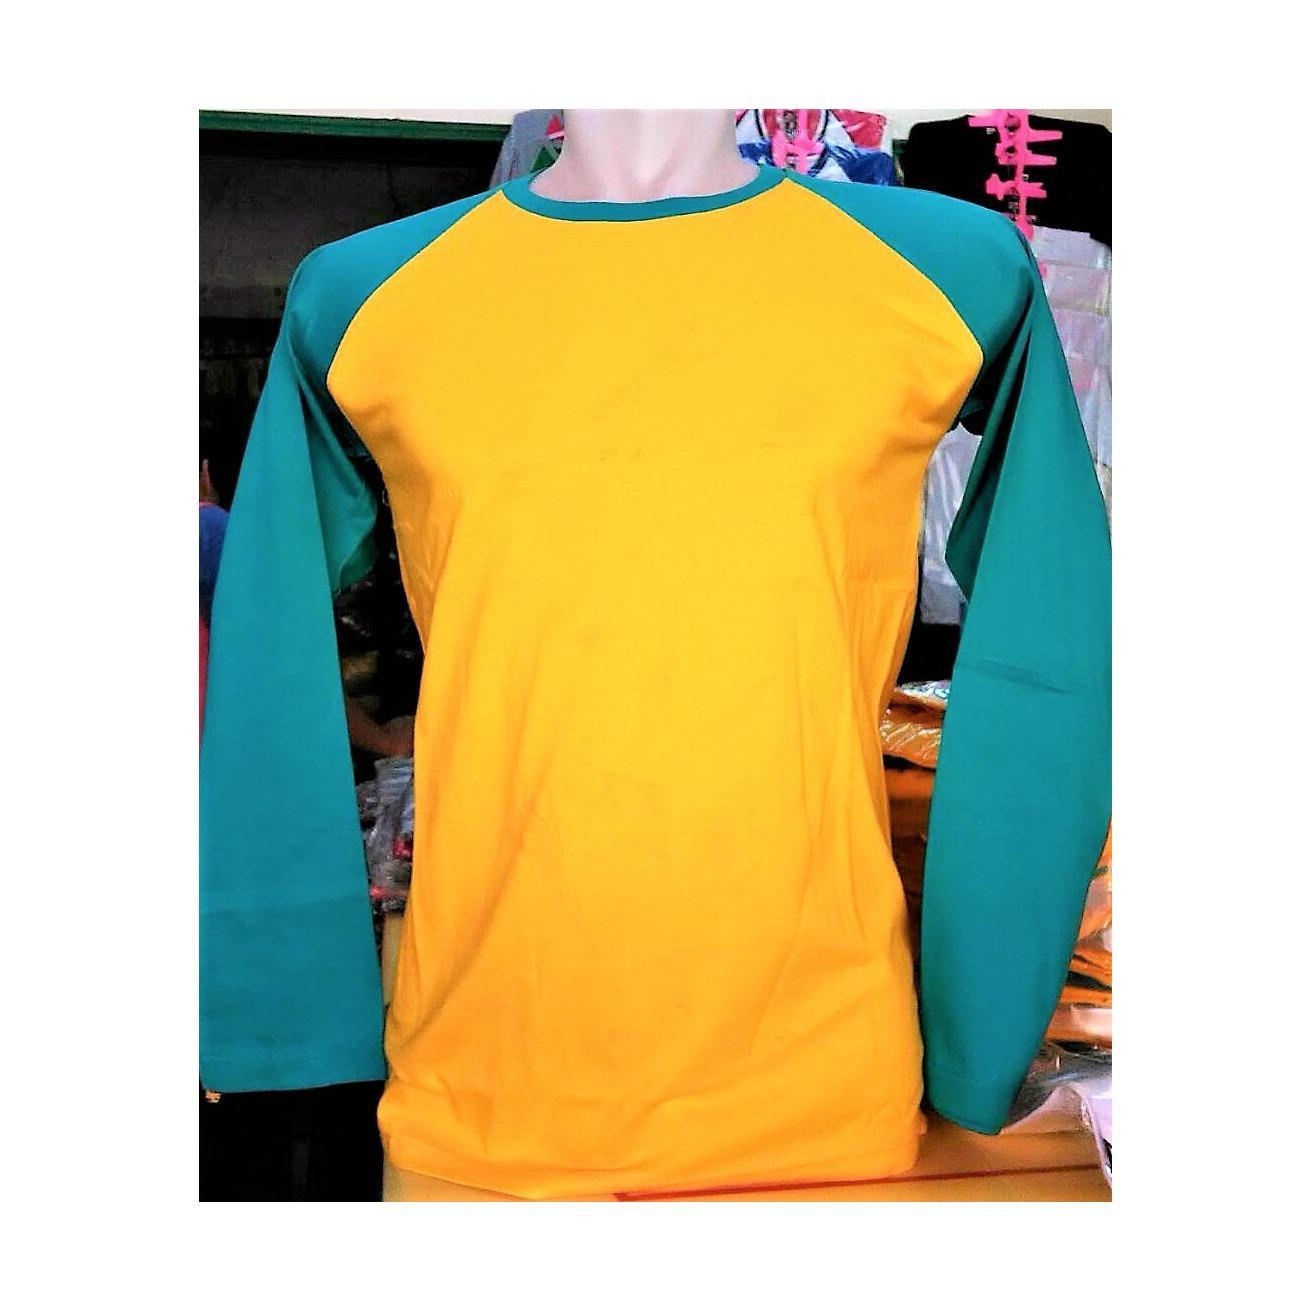 Kaos Reglan PREMIUM QUALITY Tshirt Lengan Panjang Branded